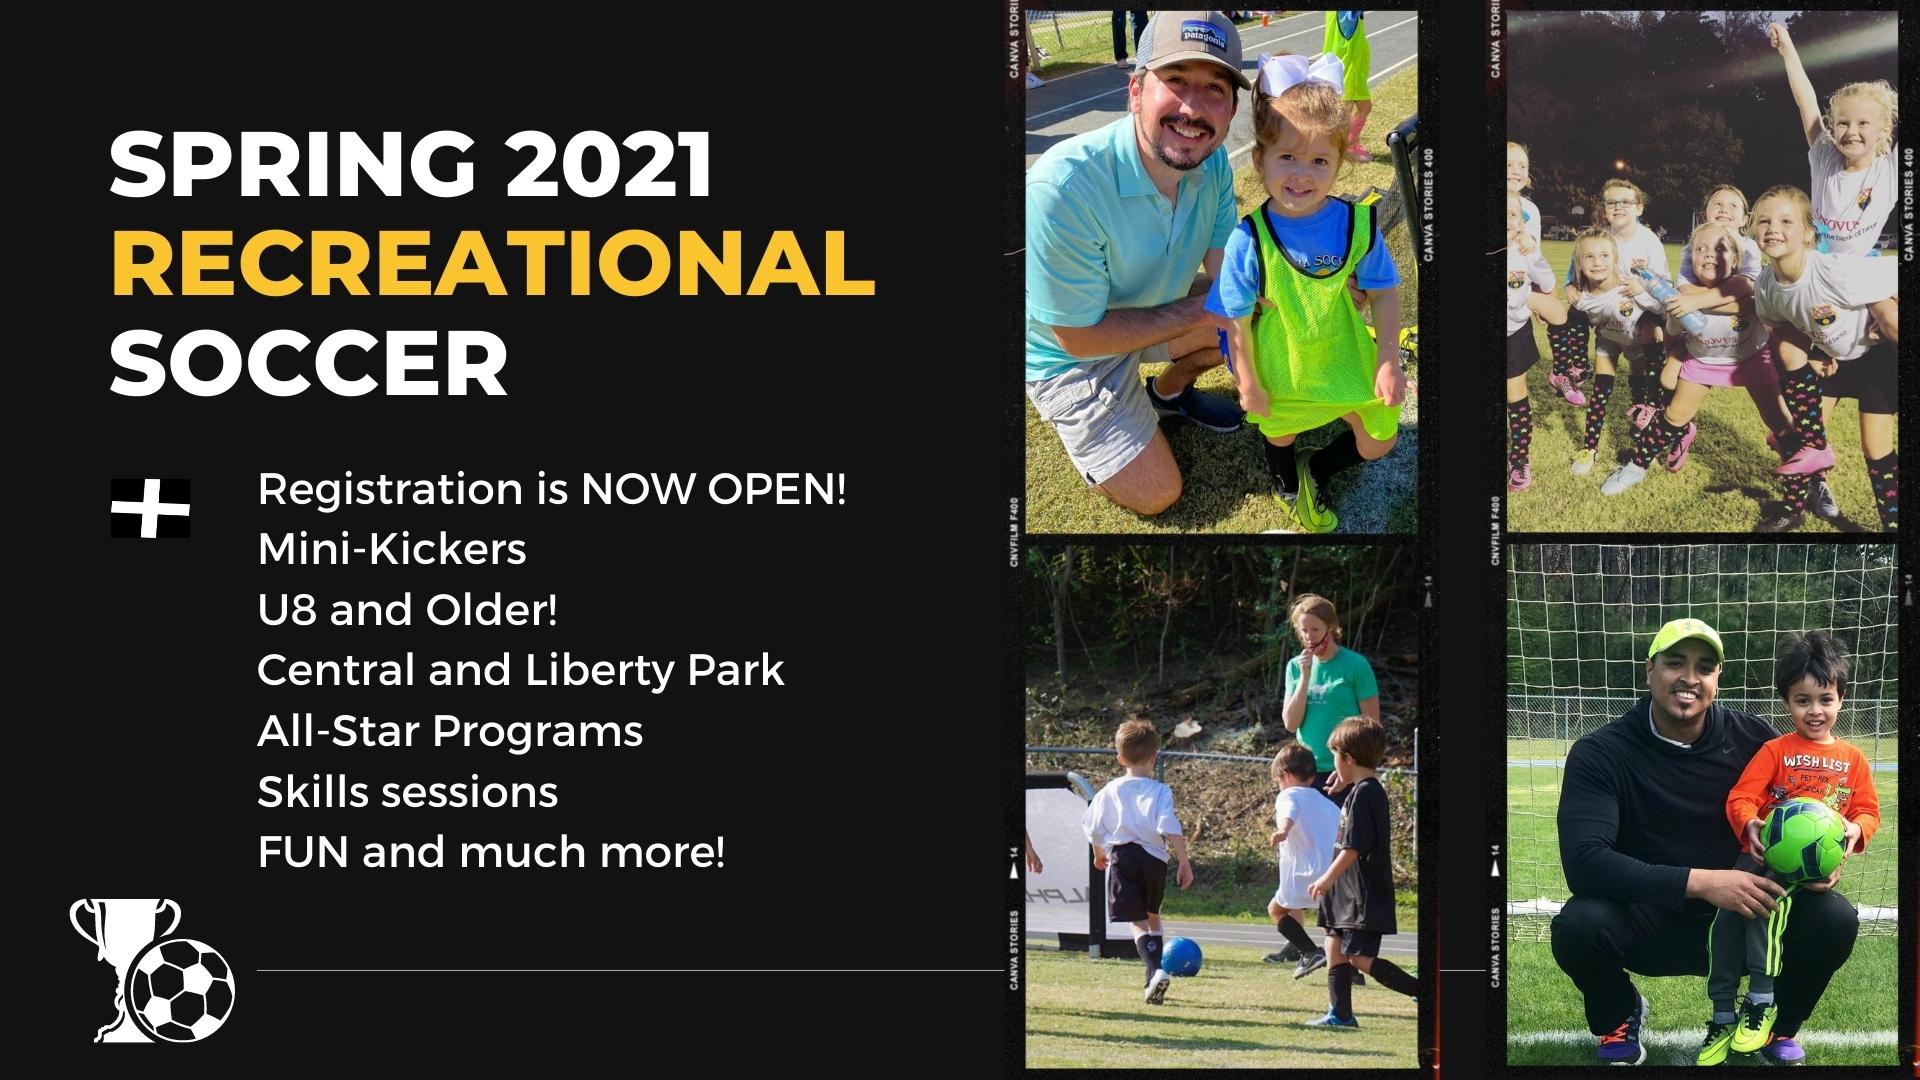 1920x1080 2021 Spring Recreational Soccer